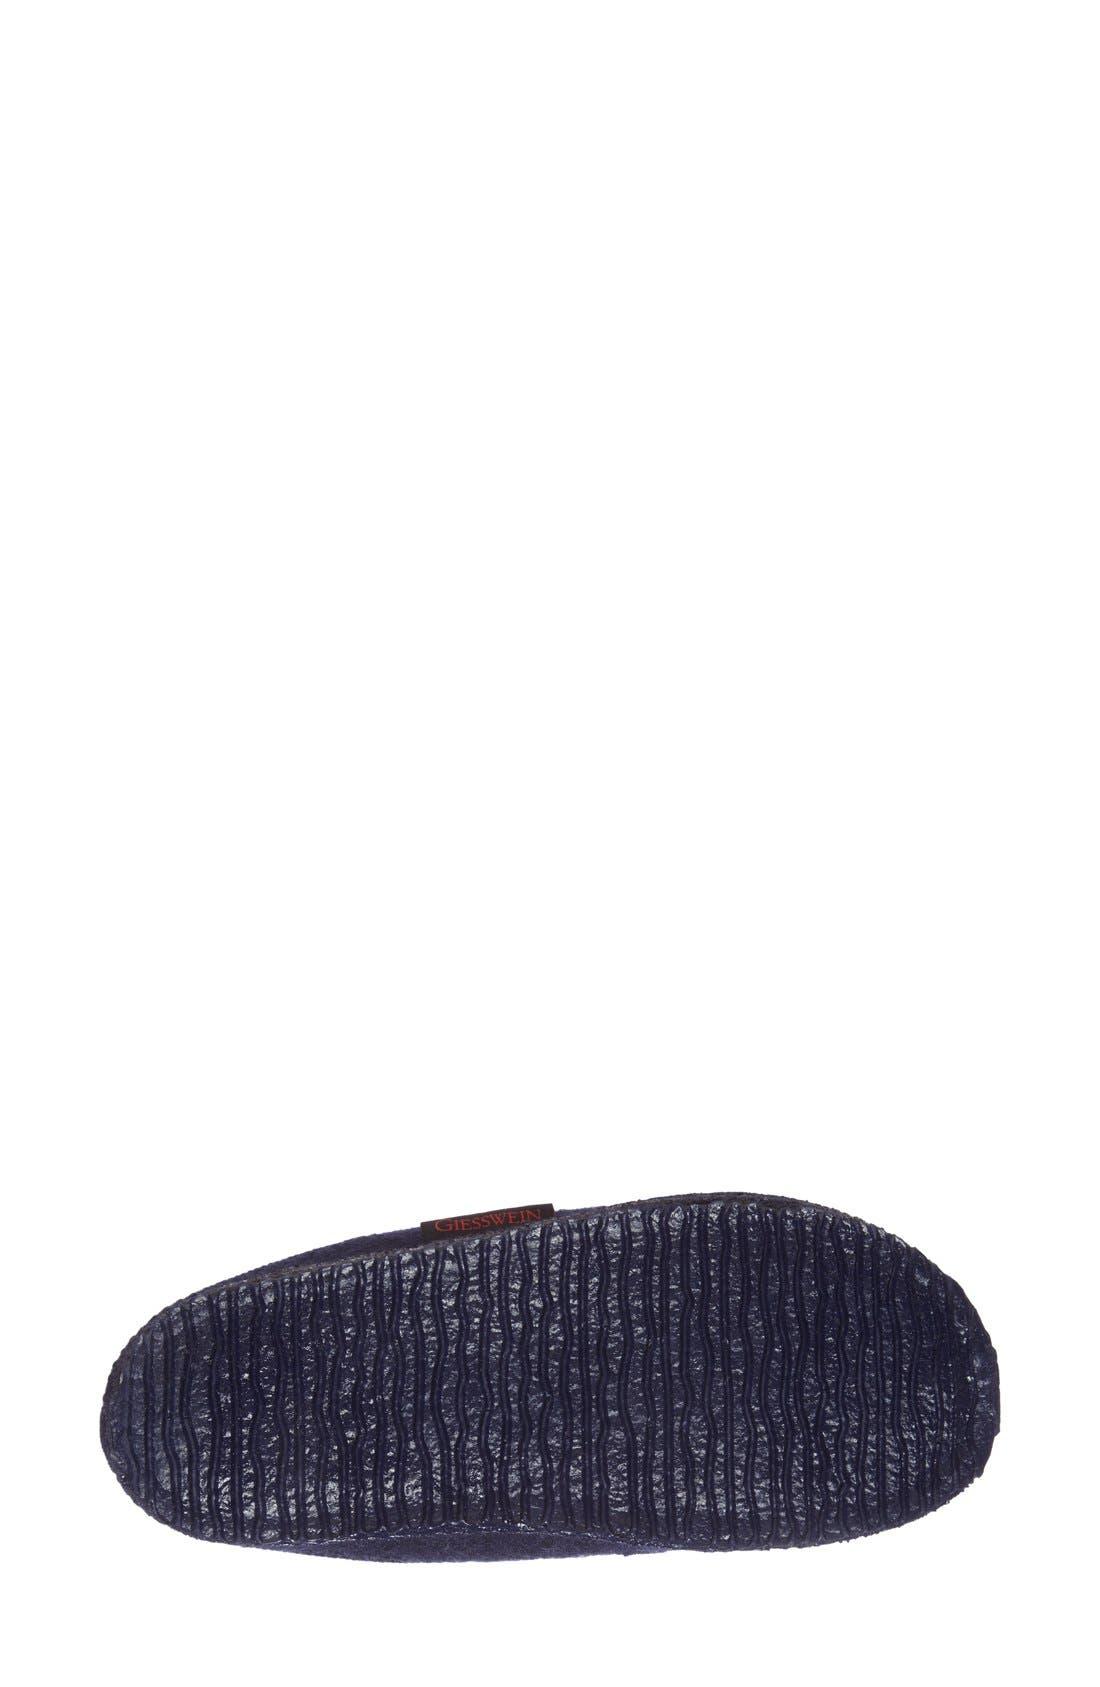 'Mado' Wool Slipper,                             Alternate thumbnail 4, color,                             NAVY WOOL